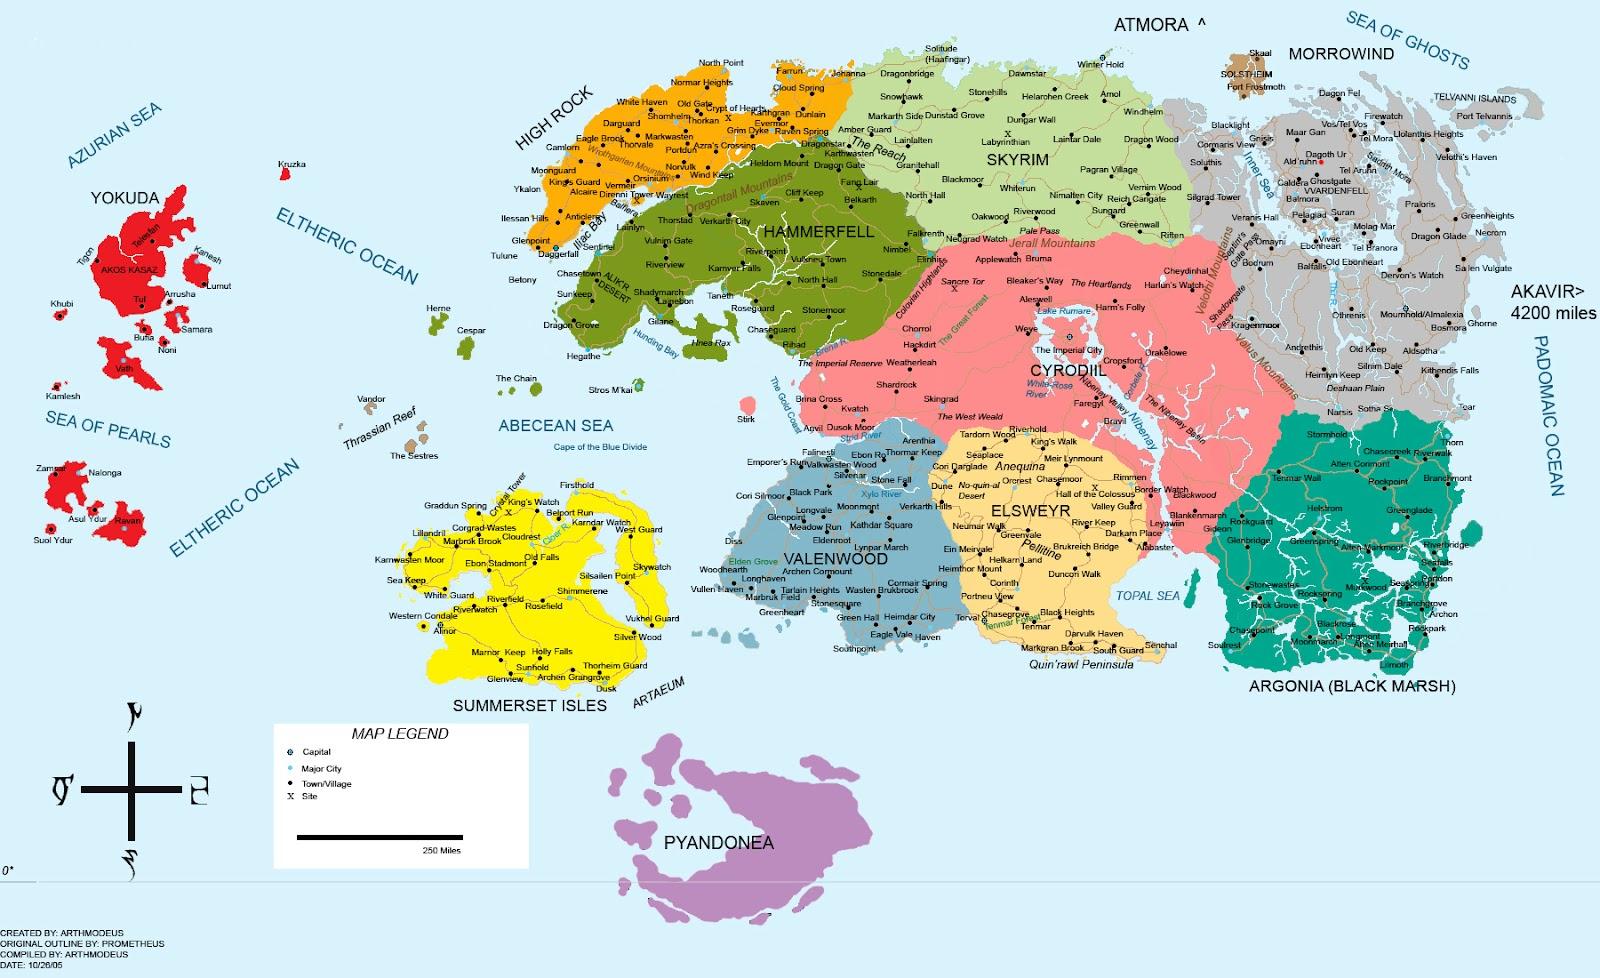 Gua de the elder scrolls v skyrim mapas mapa de tamriel gumiabroncs Image collections